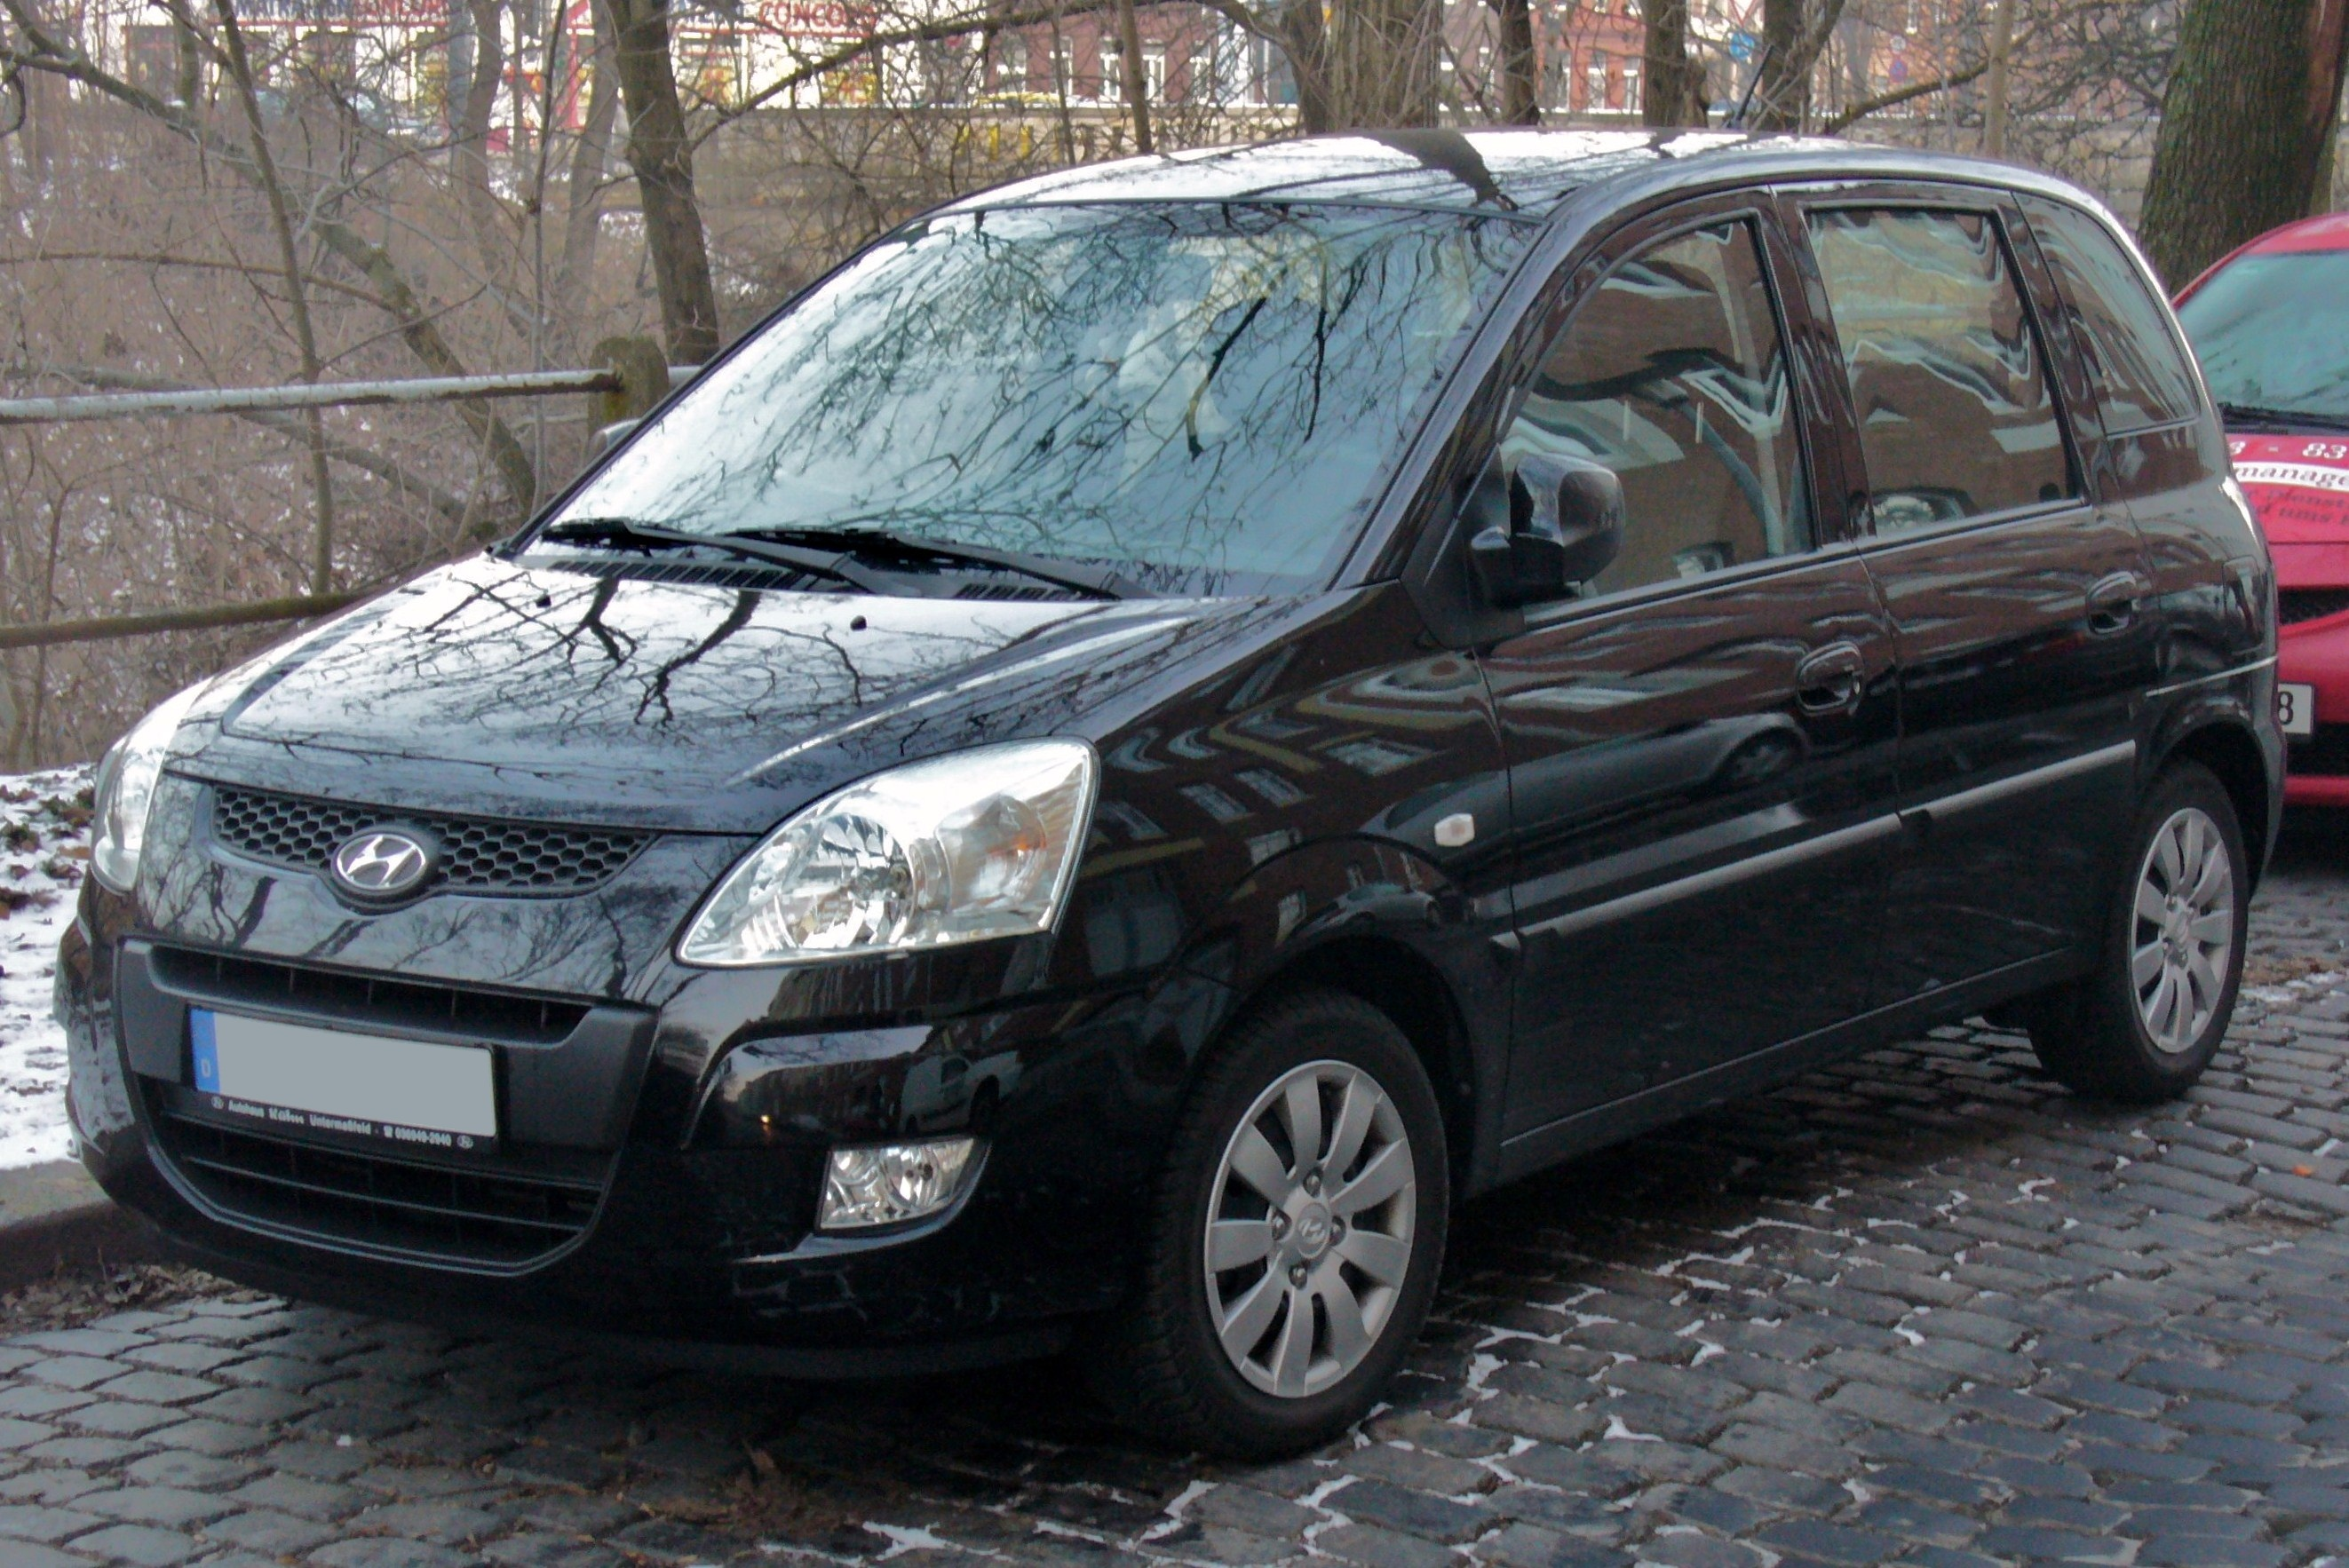 File:Hyundai Matrix Facelift 2008.JPG